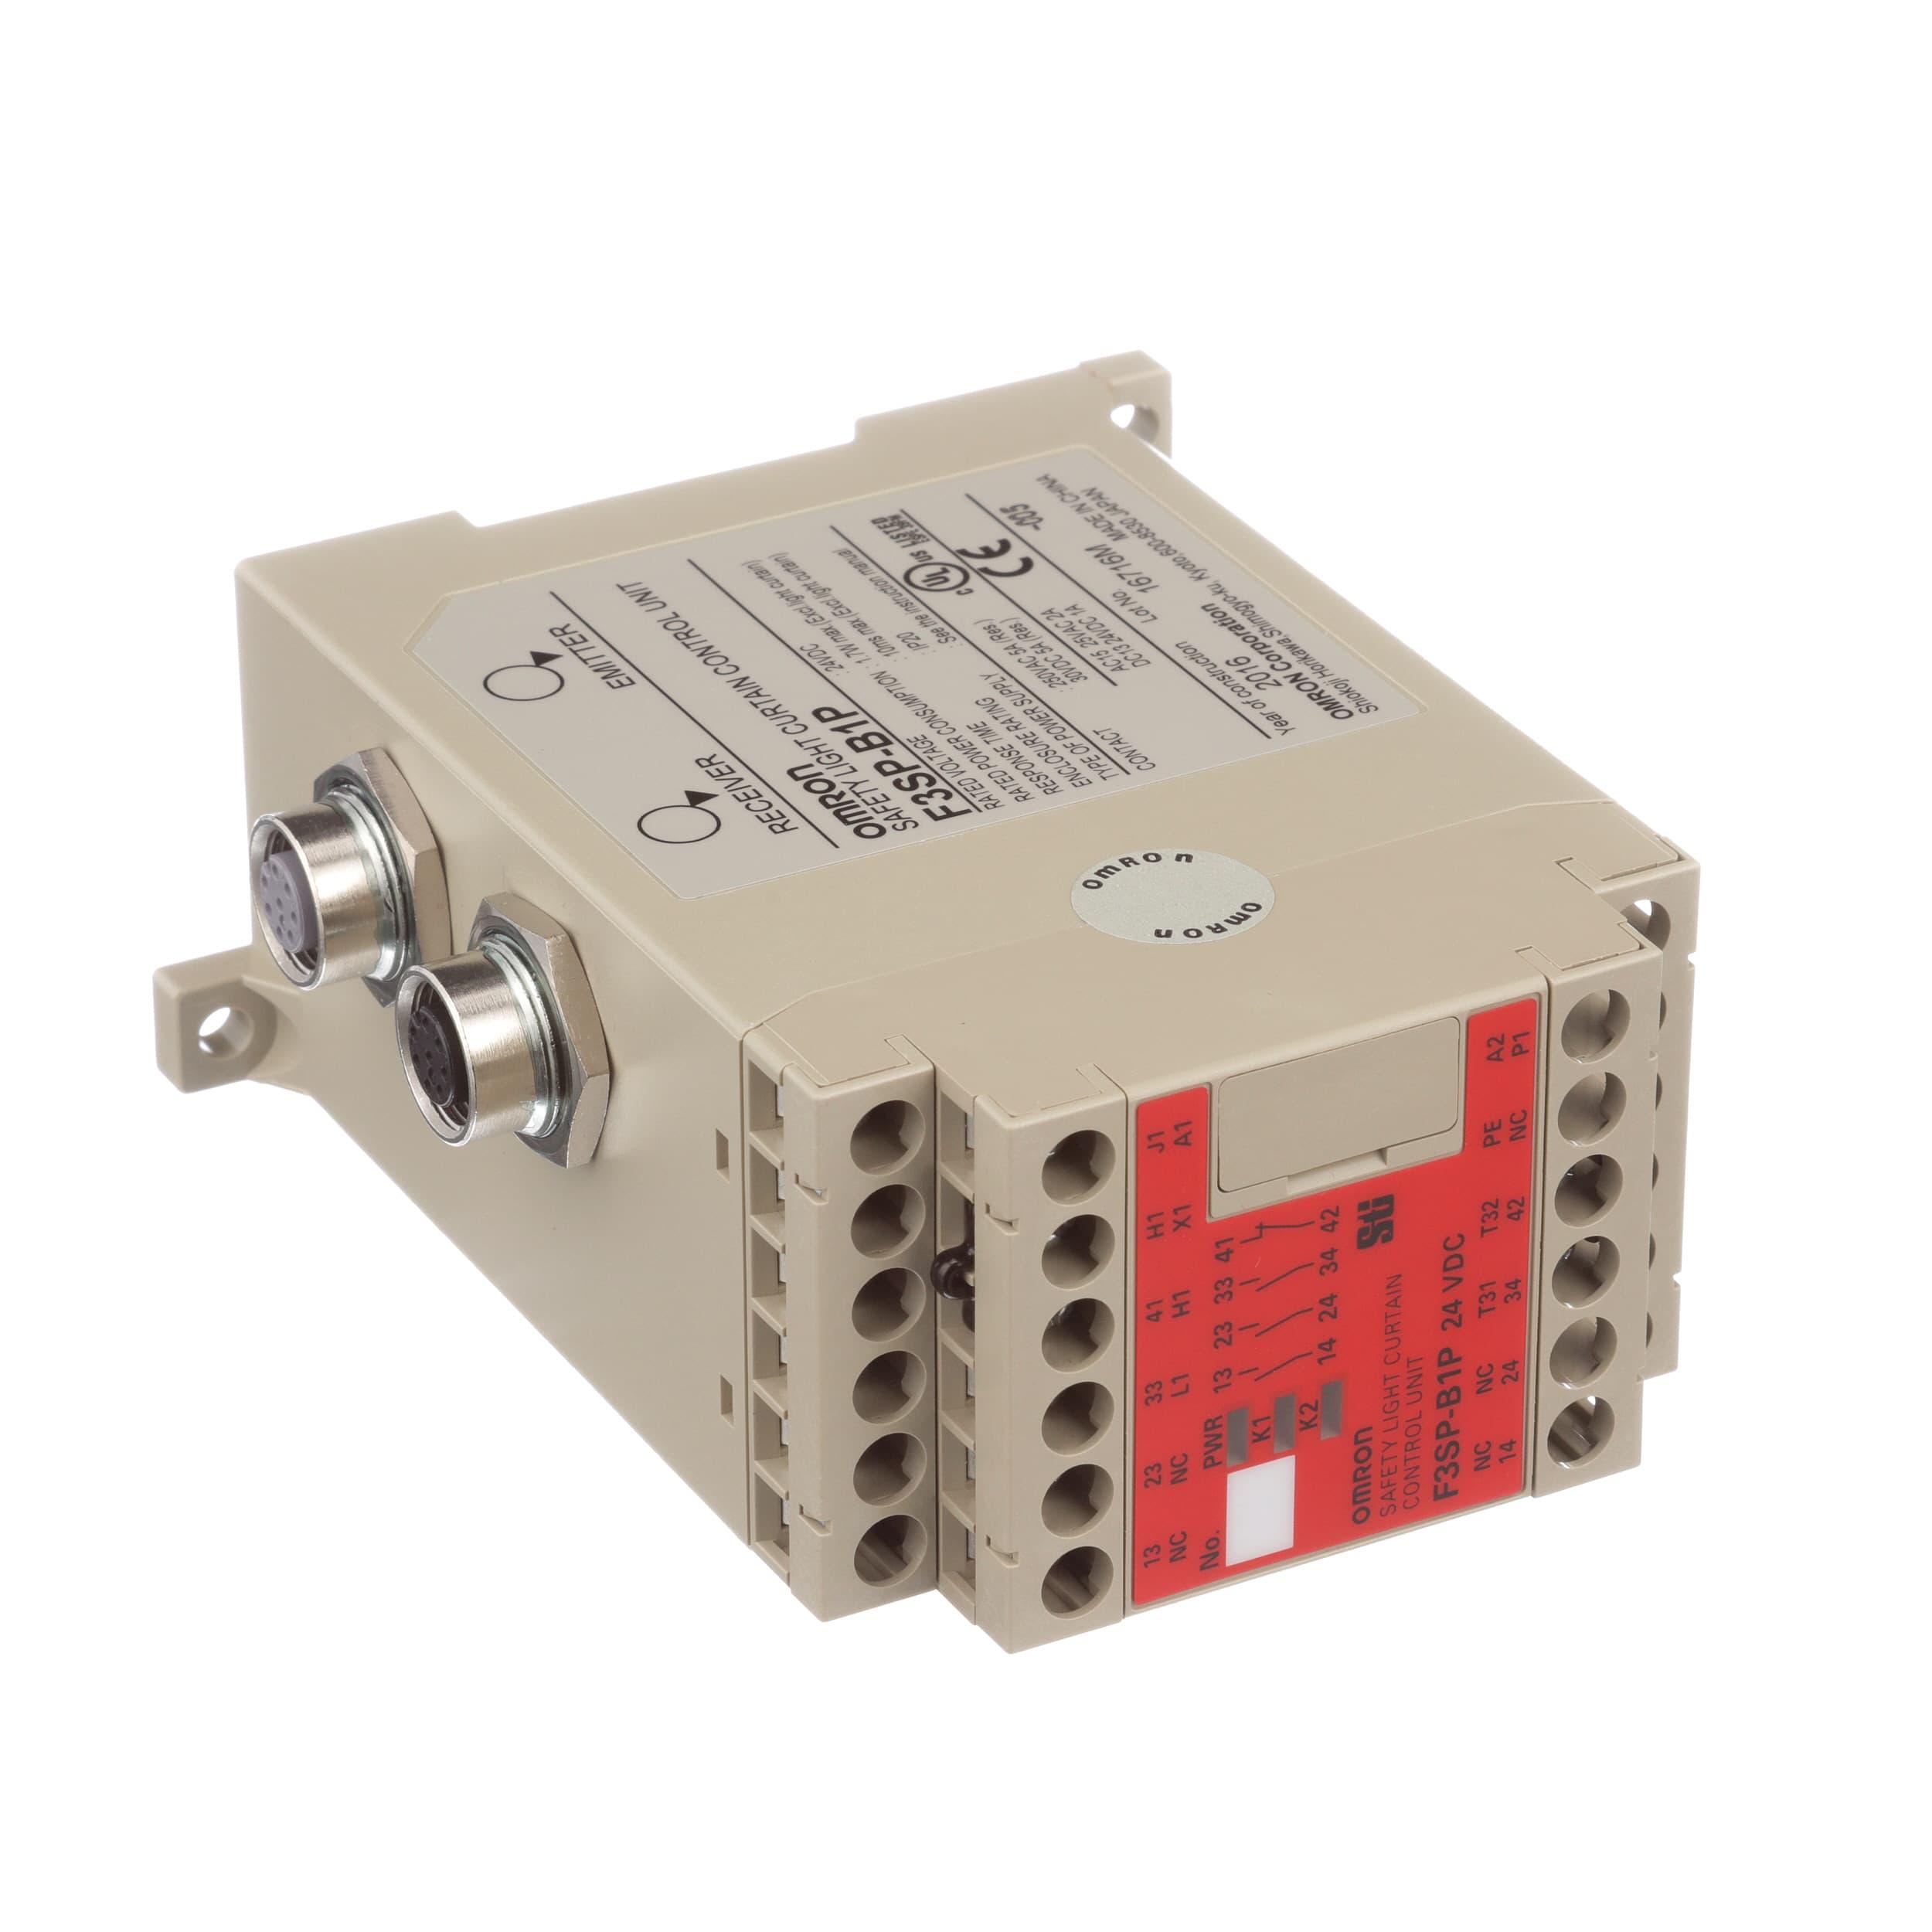 F3sp B1p Omron Panel Meters Distributors Price Comparison